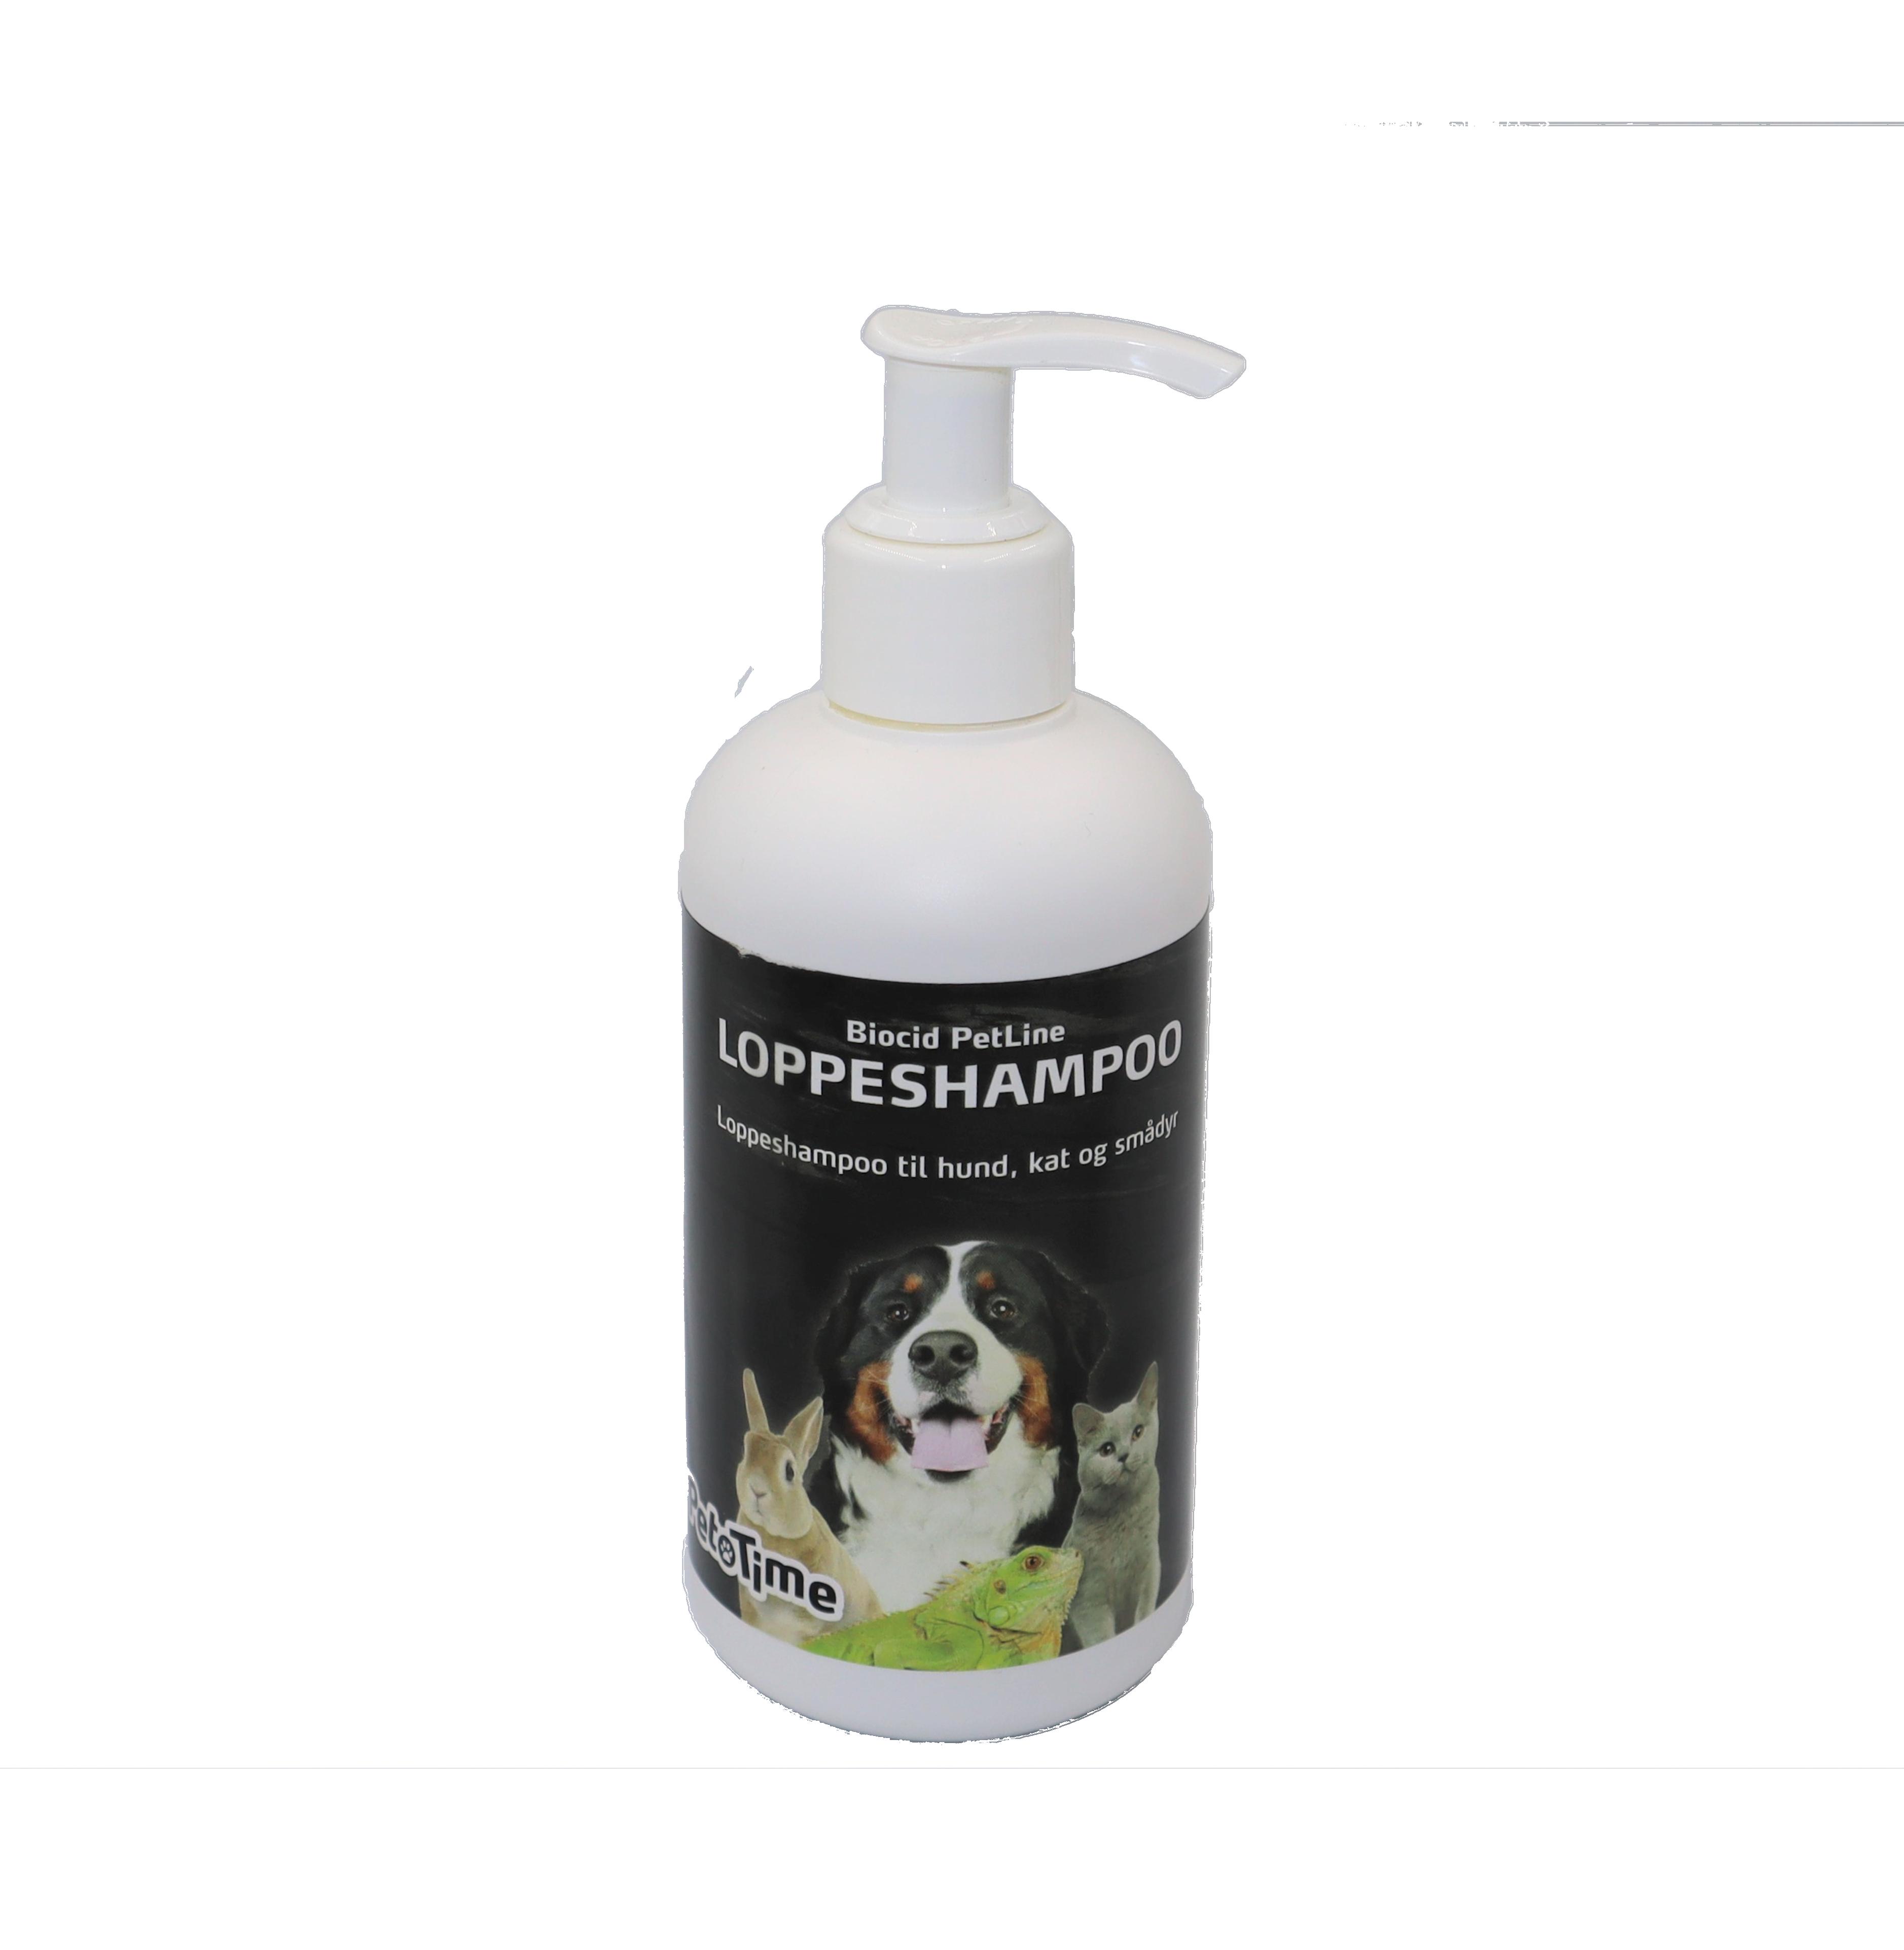 Petline Loppe Shampoo 250 ml